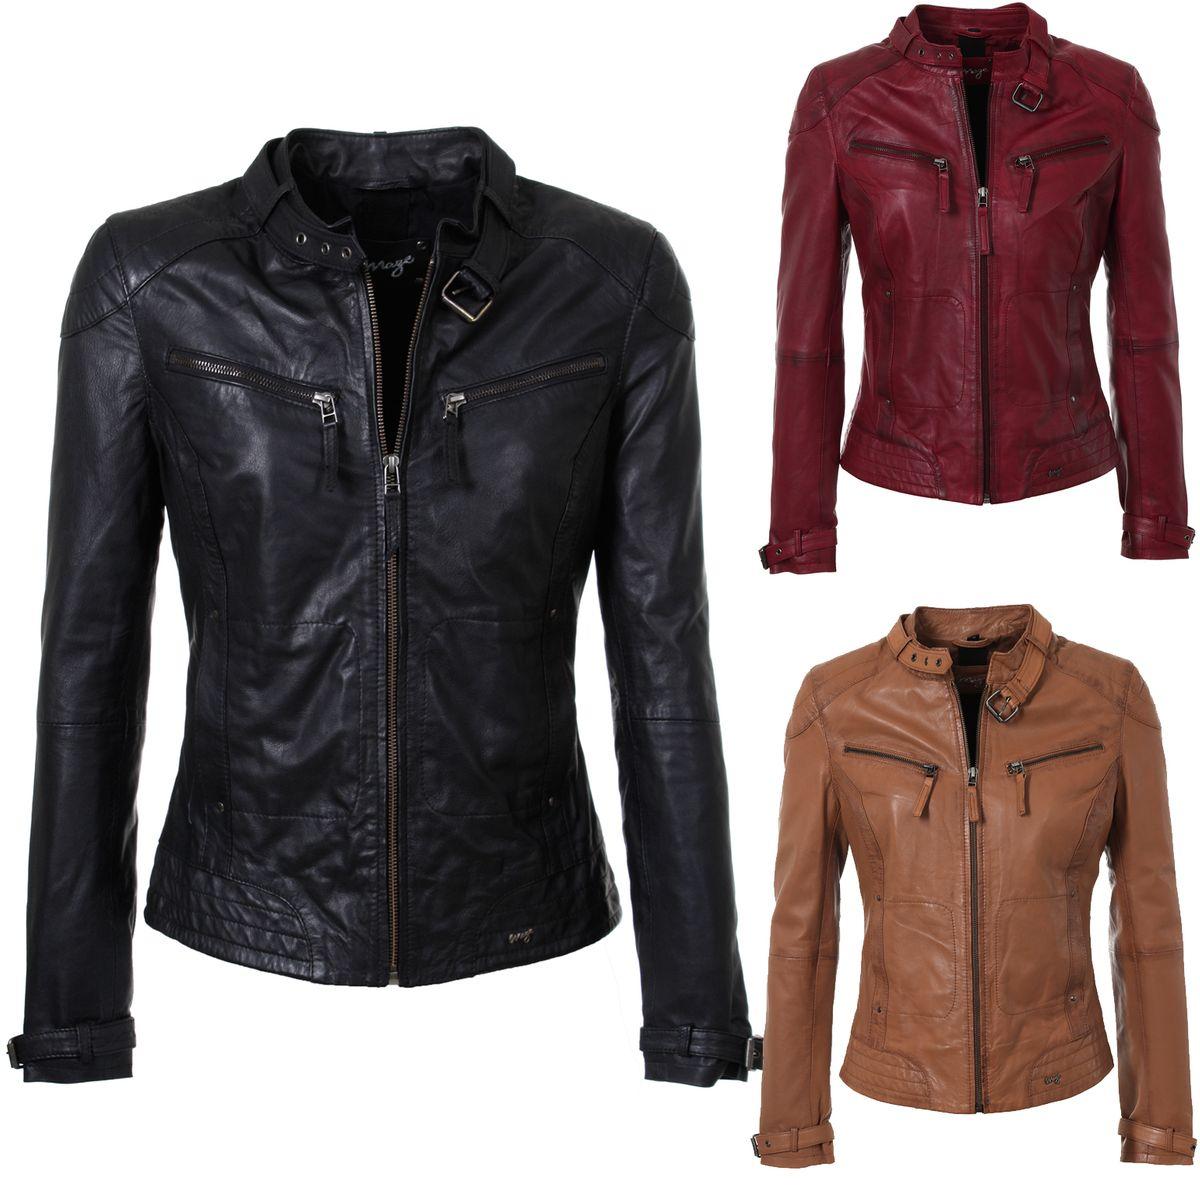 About Original Maze 31 Ryana Title Mj Details Jacket Women Transition Show Biker Fitted Leather Womens wTZOPiulXk